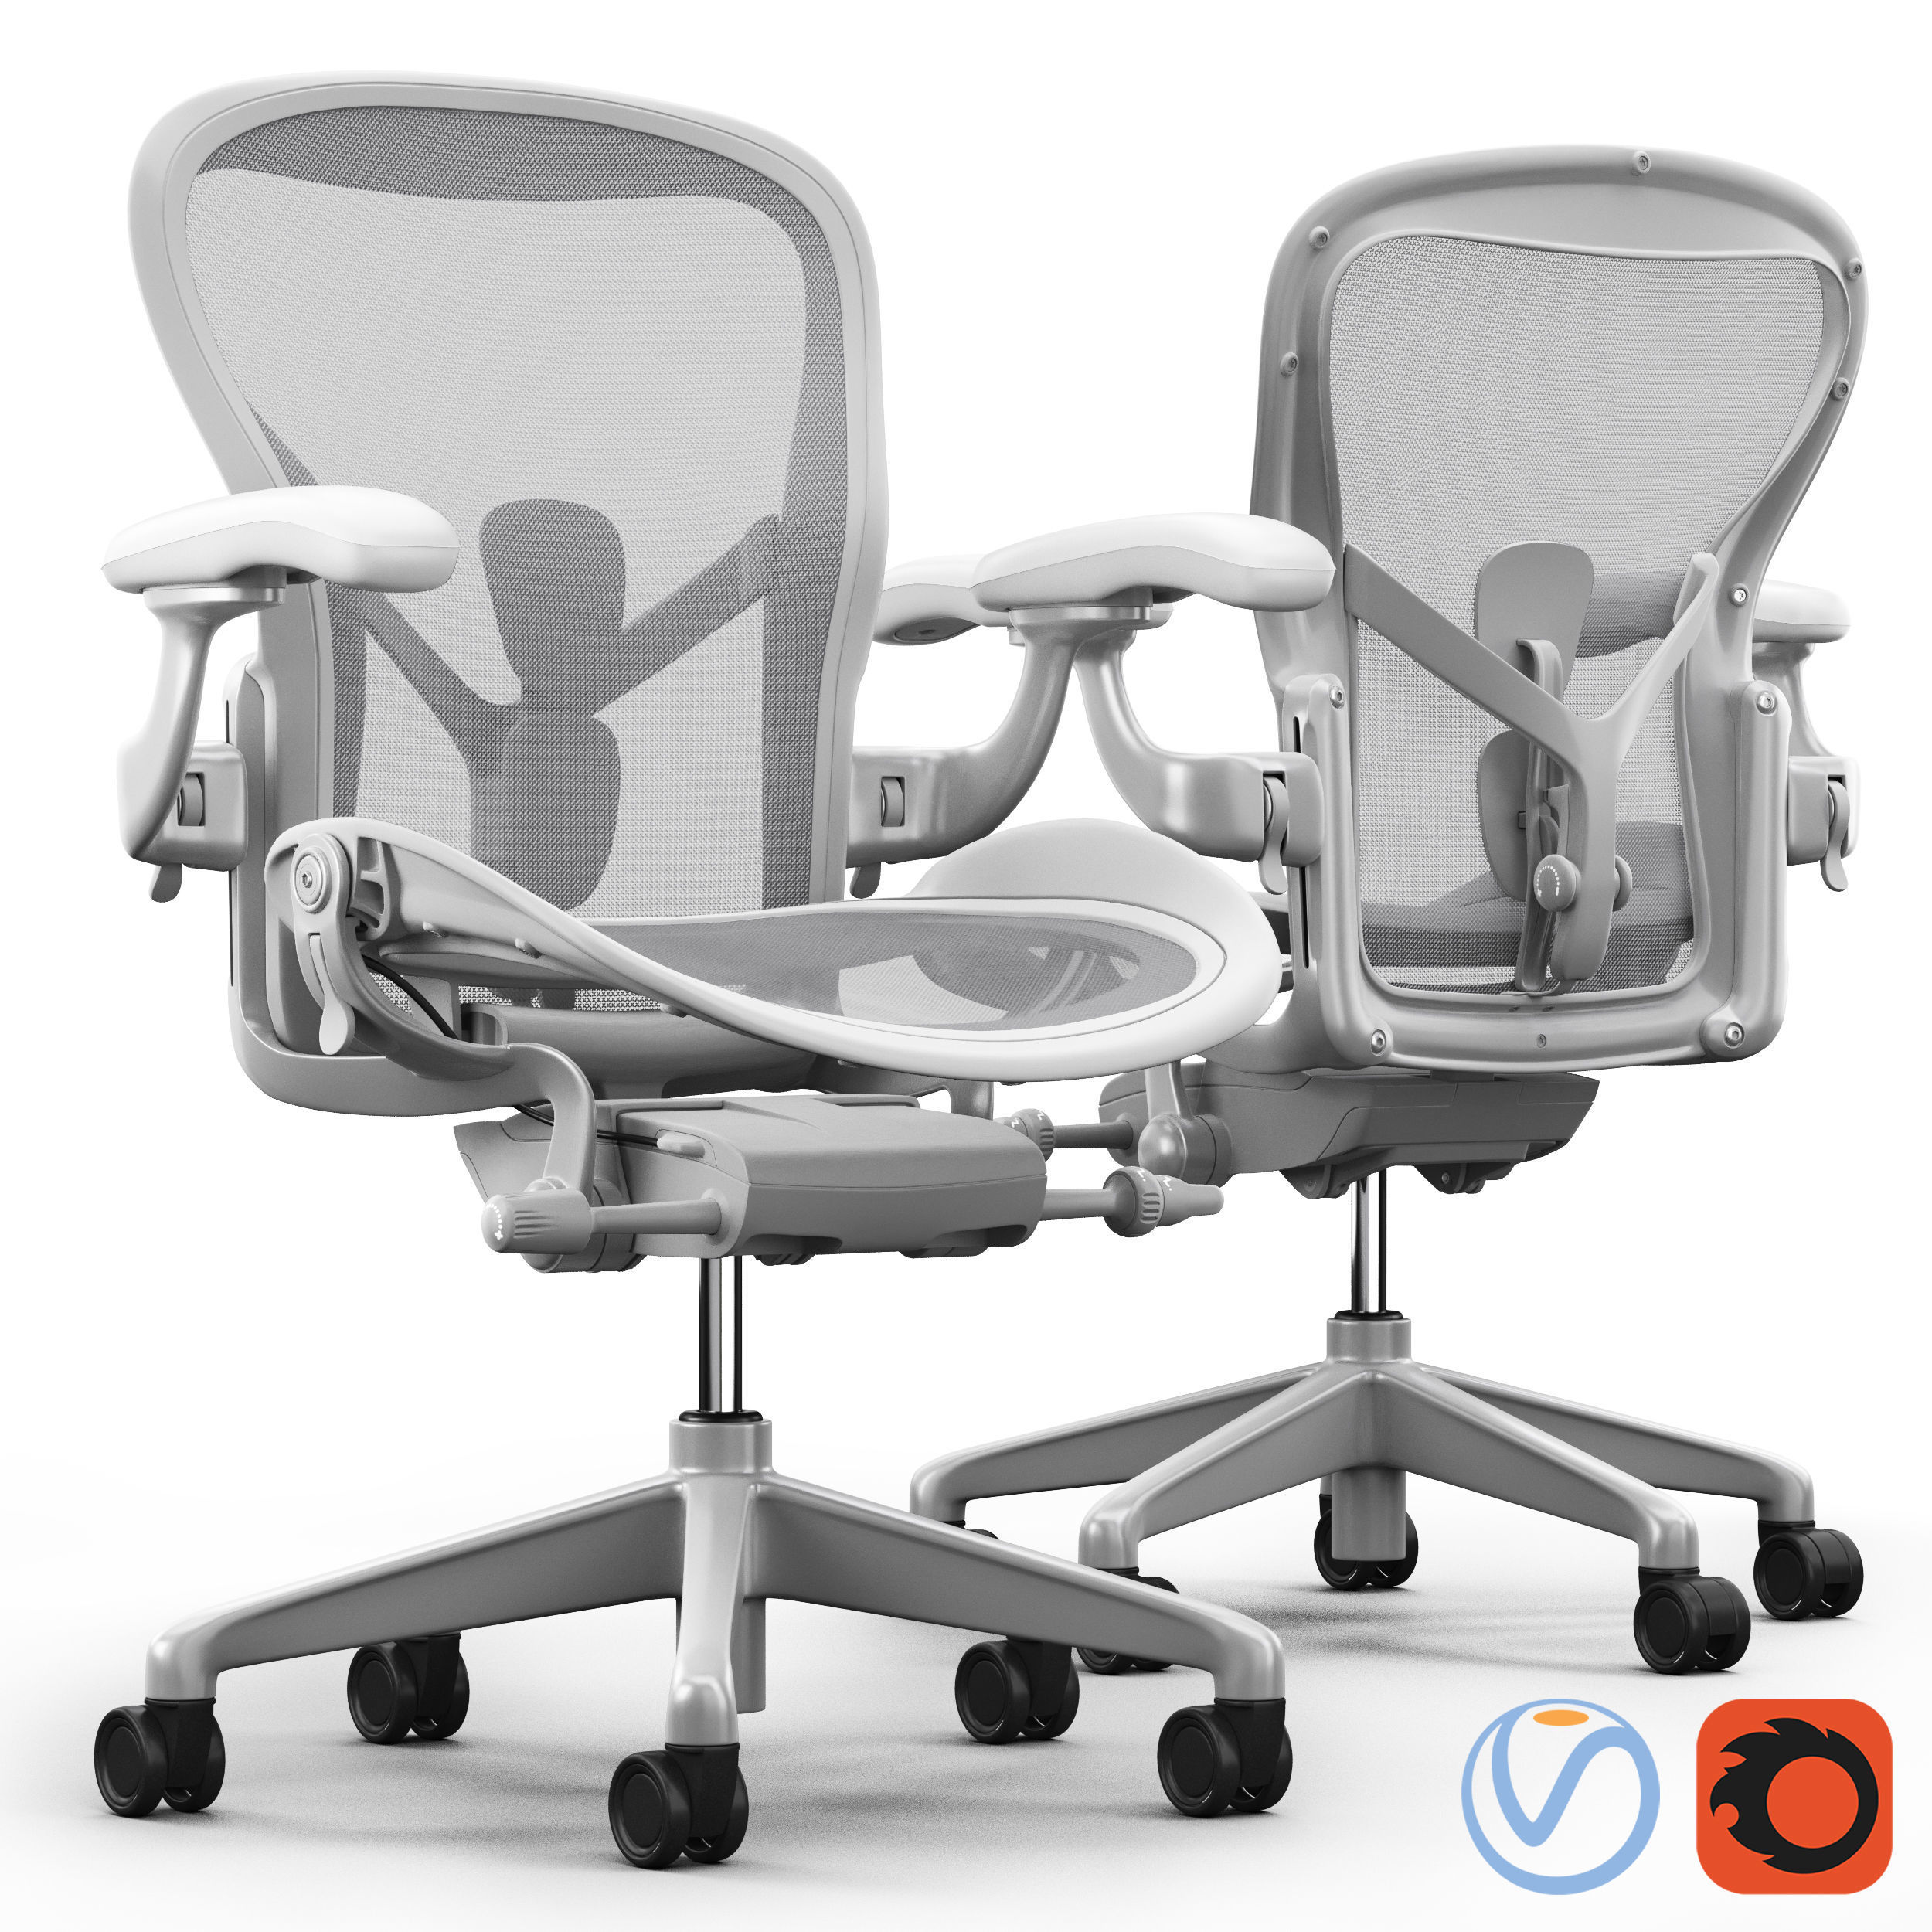 Chair Herman Miller Aeron  48D model